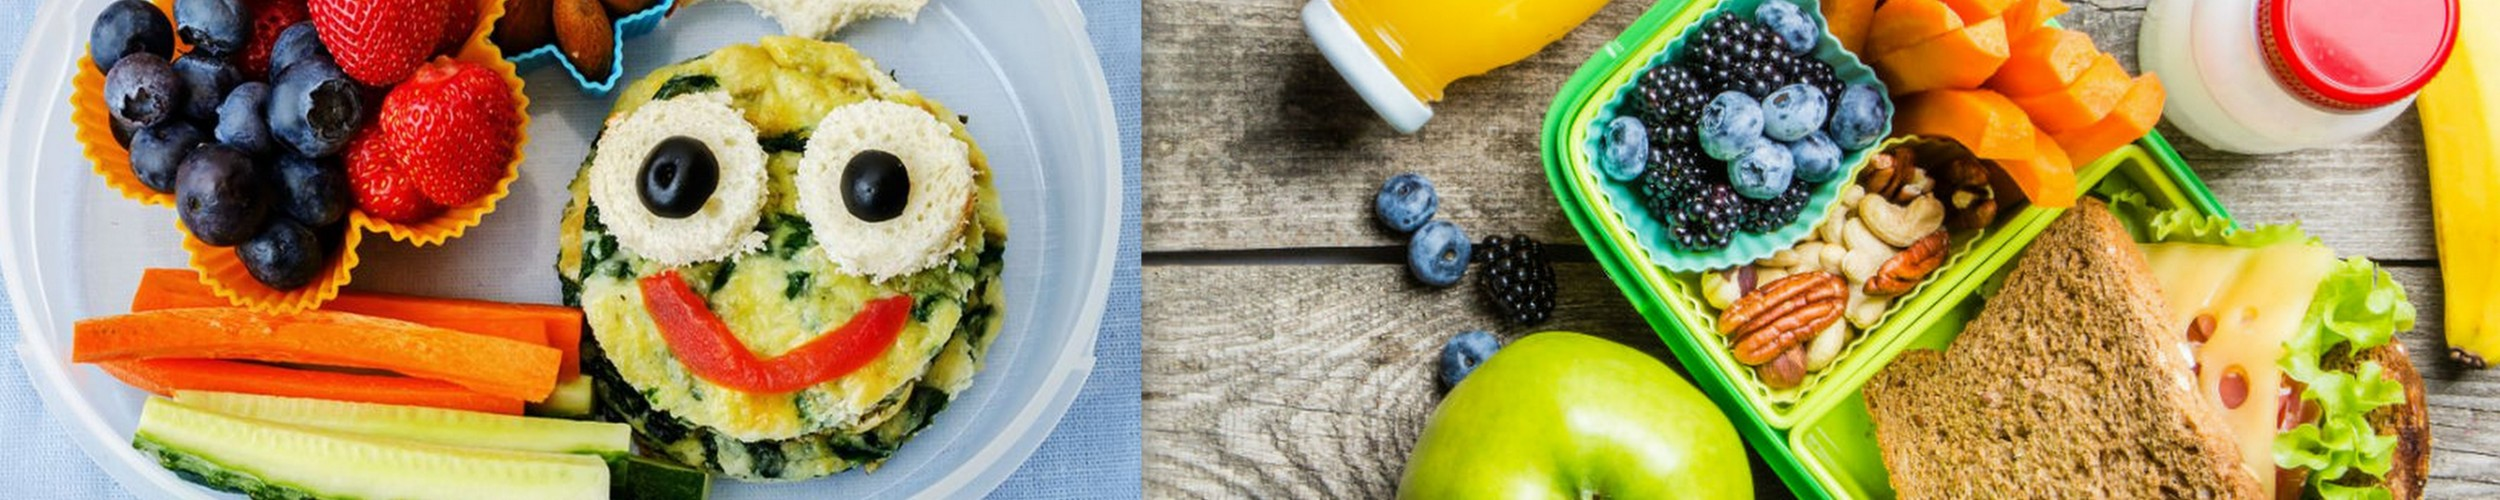 Zdravi do skol kurz vareni pro deti a rodice